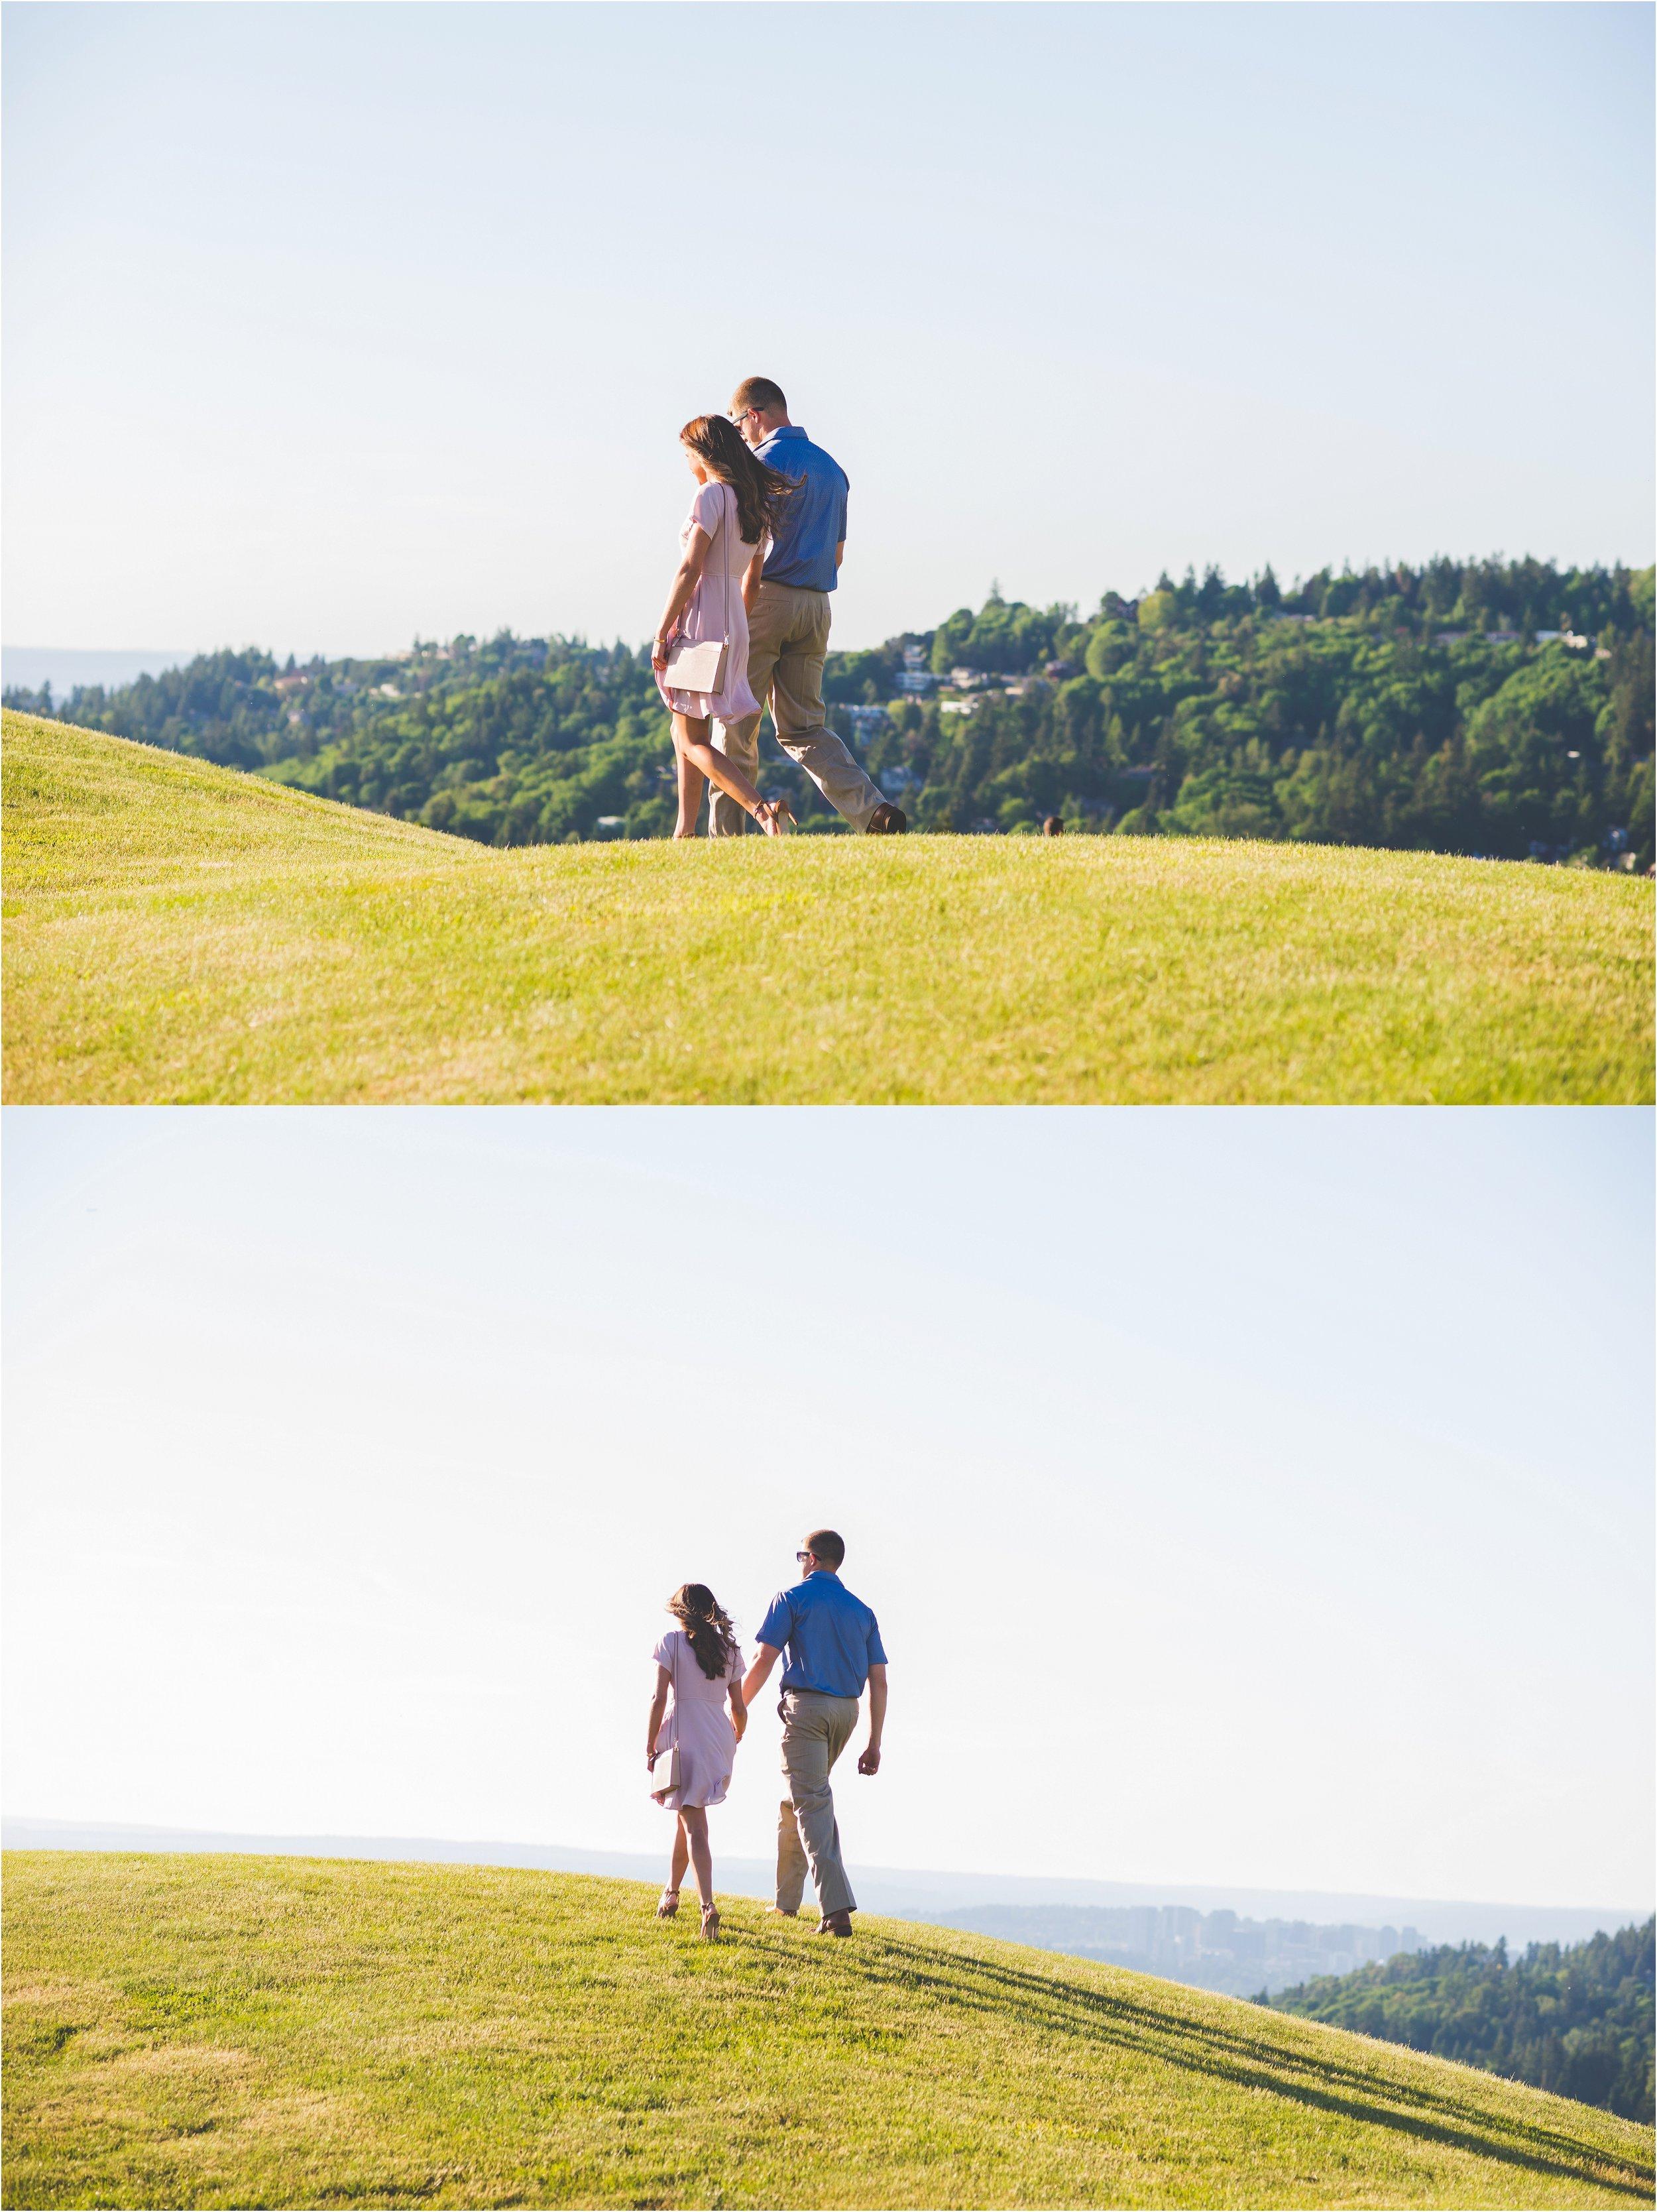 newcastle-golf-club-proposal-jannicka-mayte-seattle-washington-engagement-wedding-photographer_0001.jpg